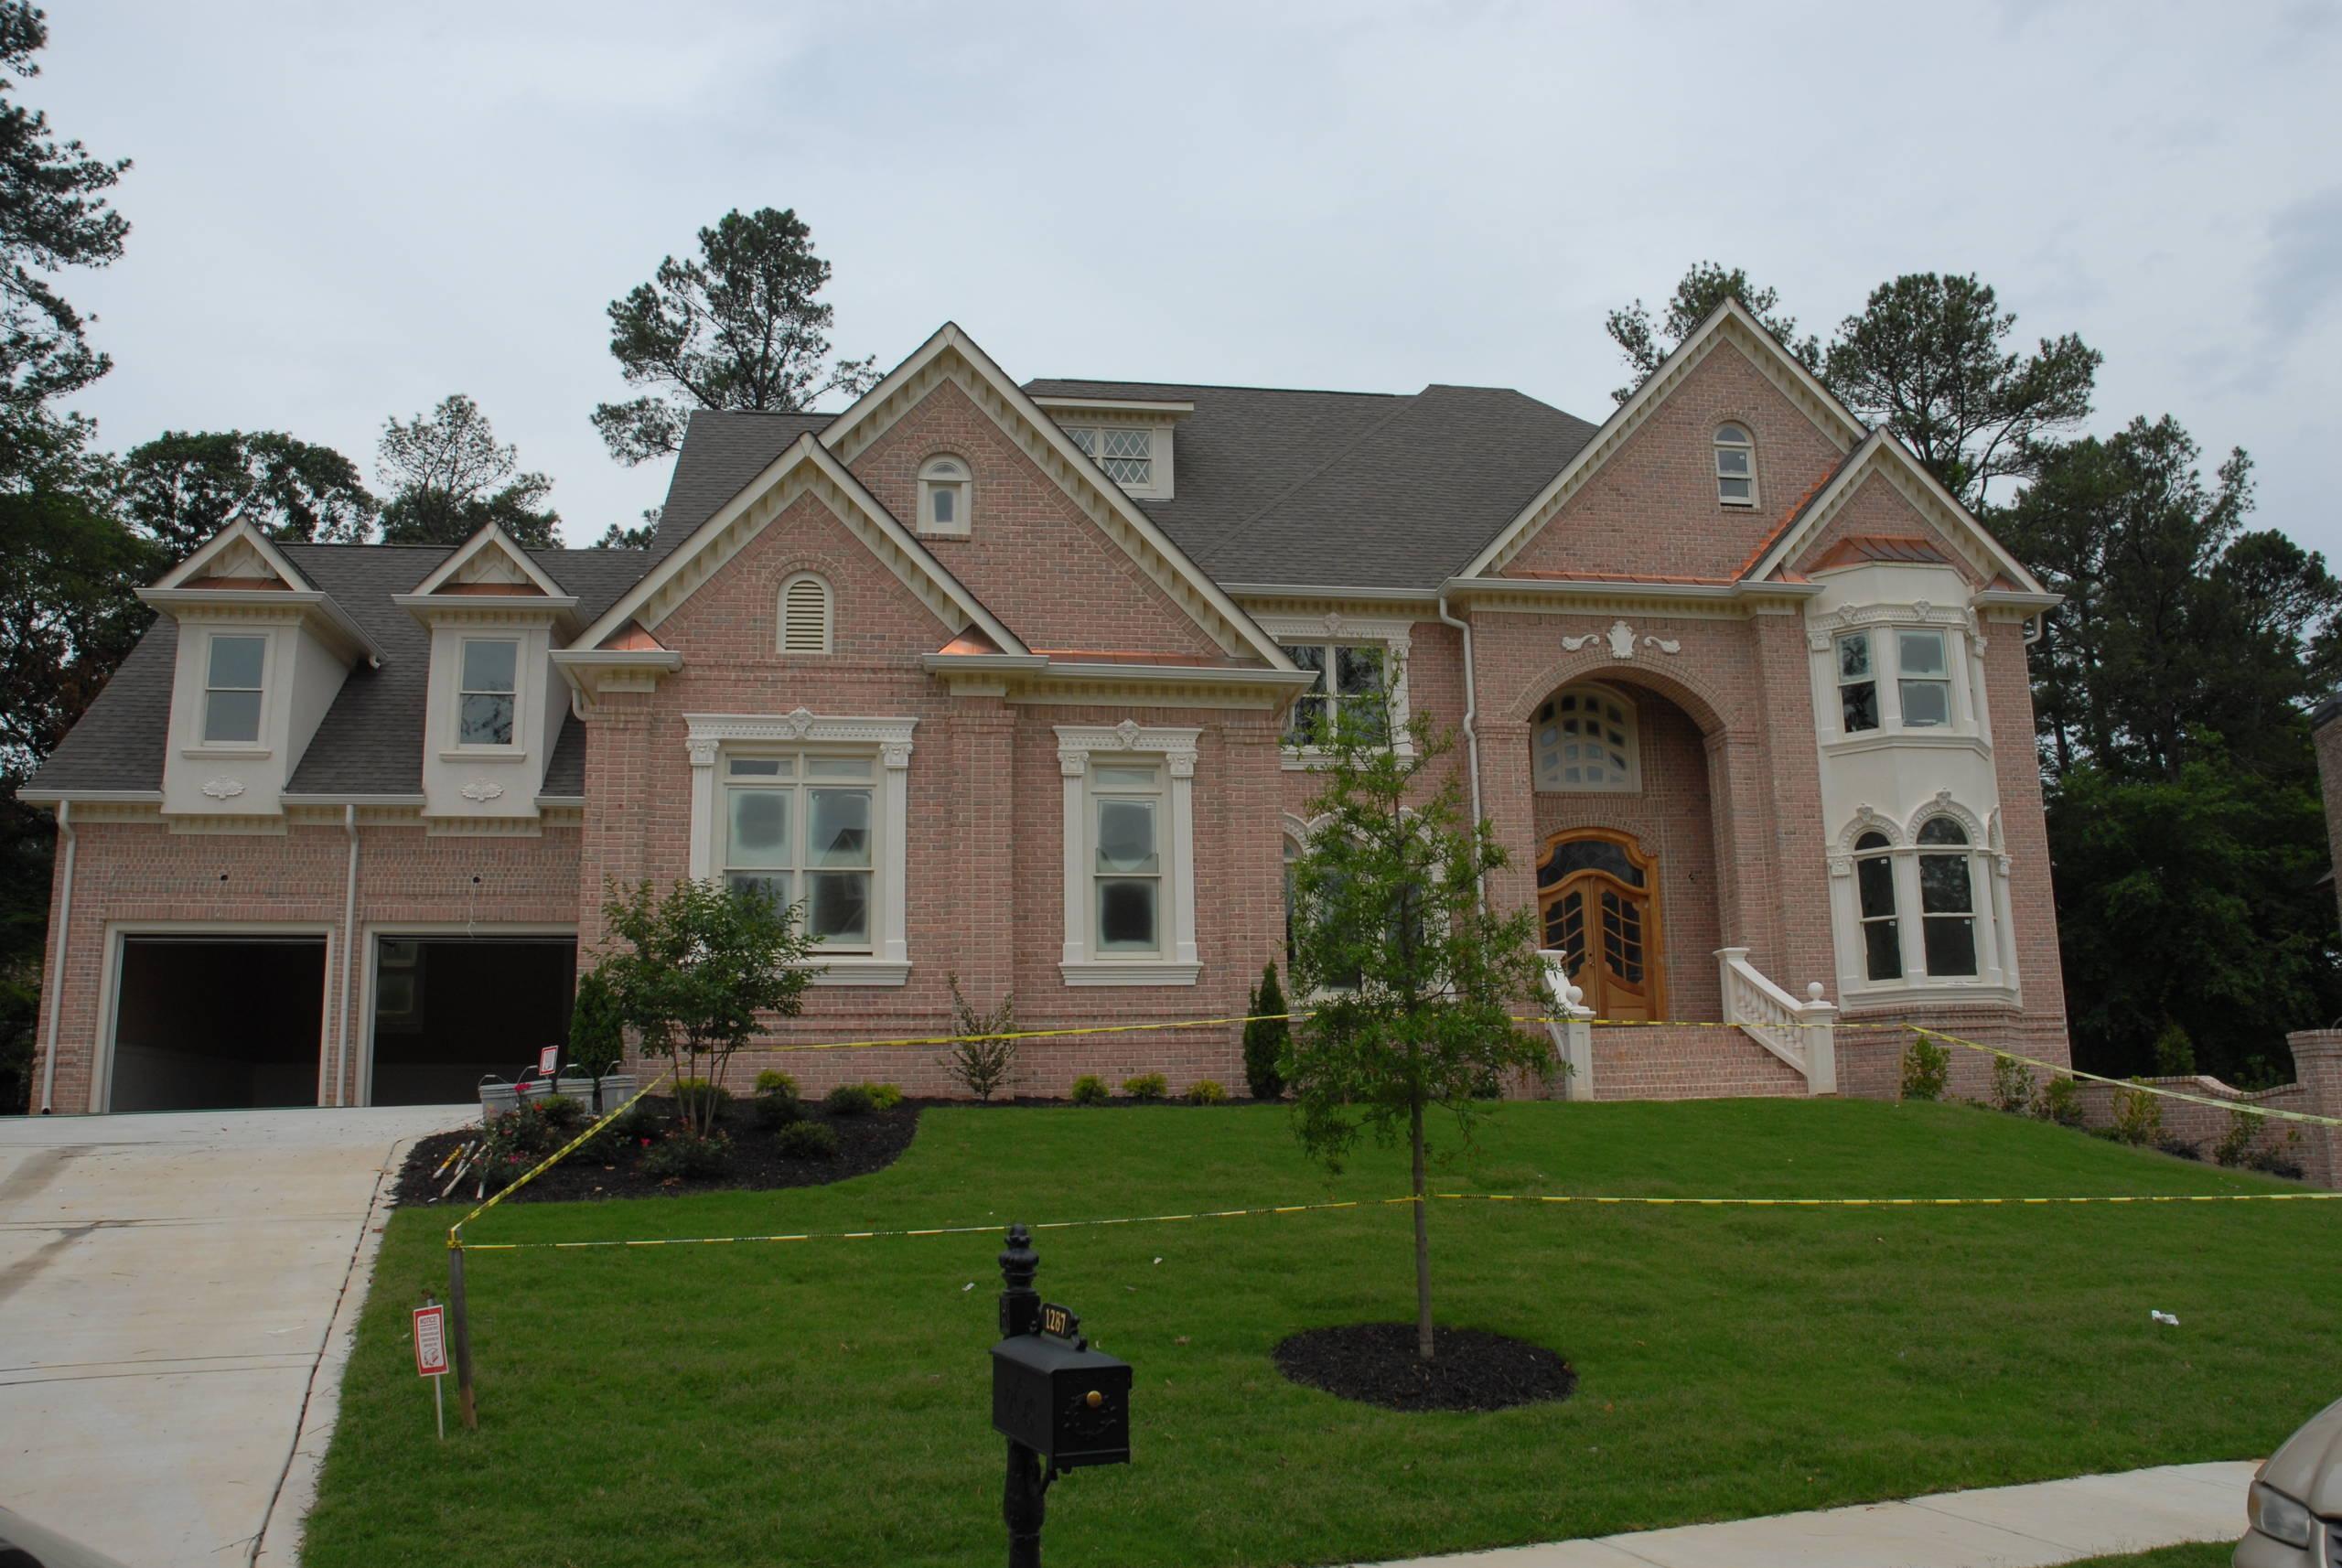 Traditional, Elegant Home Build